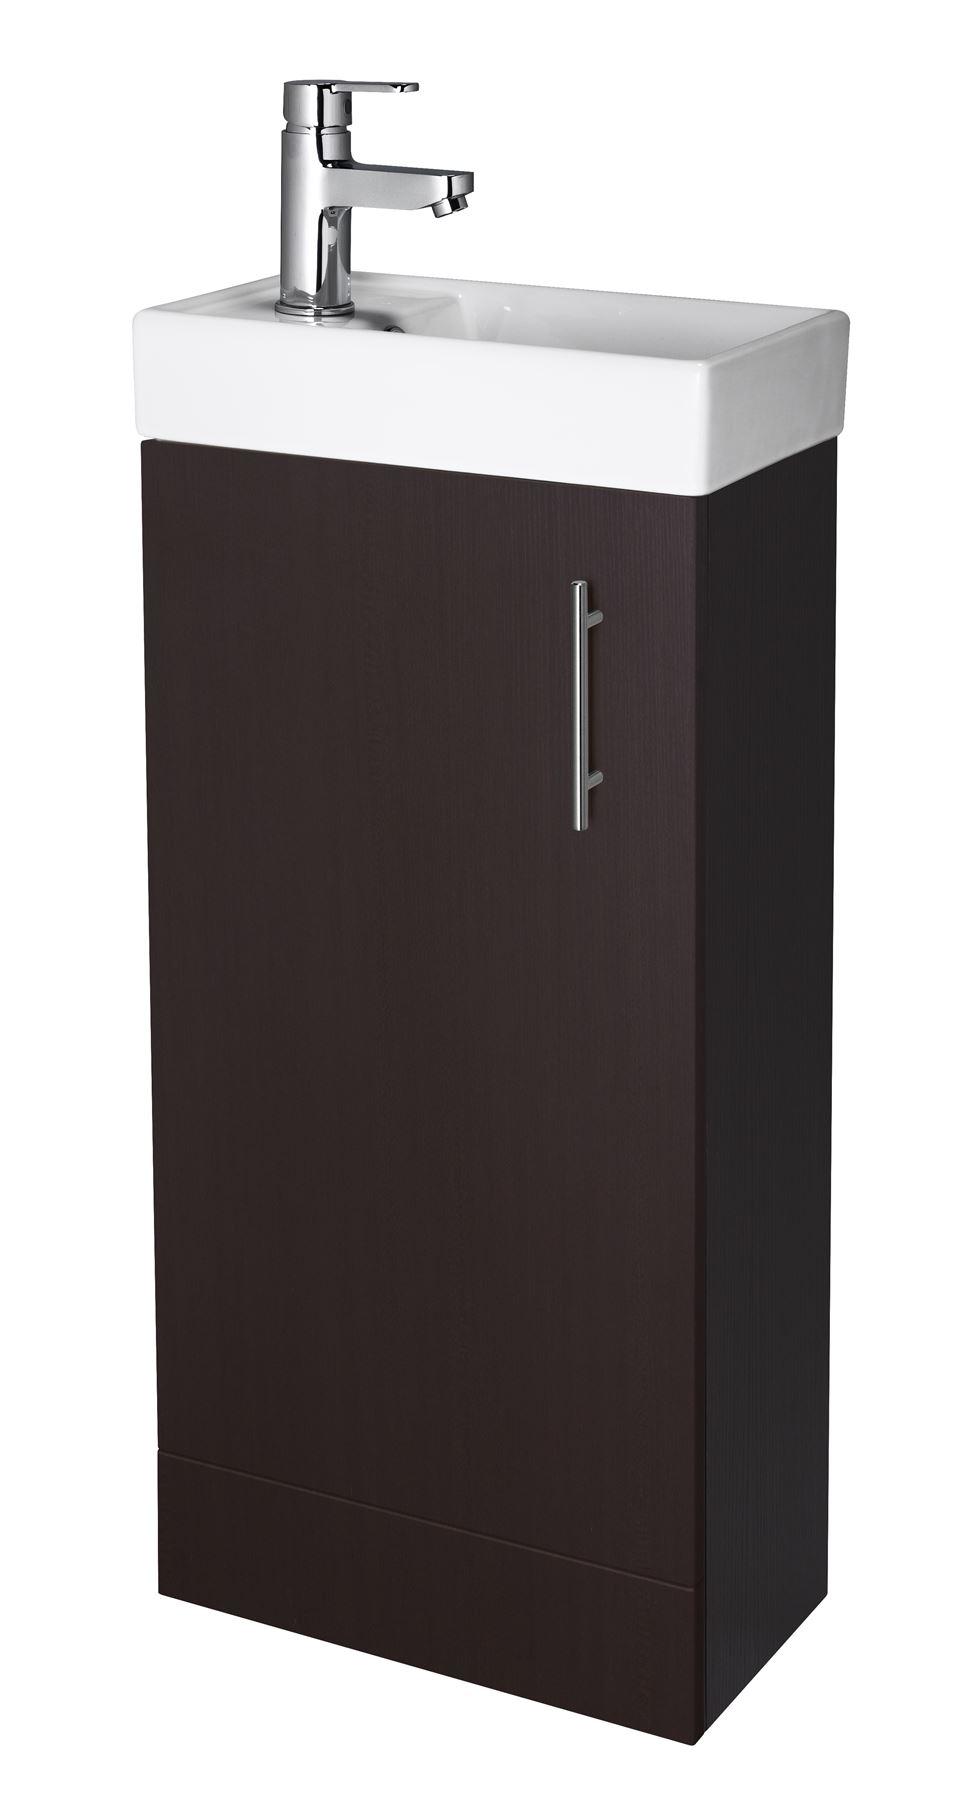 400mm Modern Bathroom Cloakroom Vanity Unit Basin Sink Floor Wall Hung